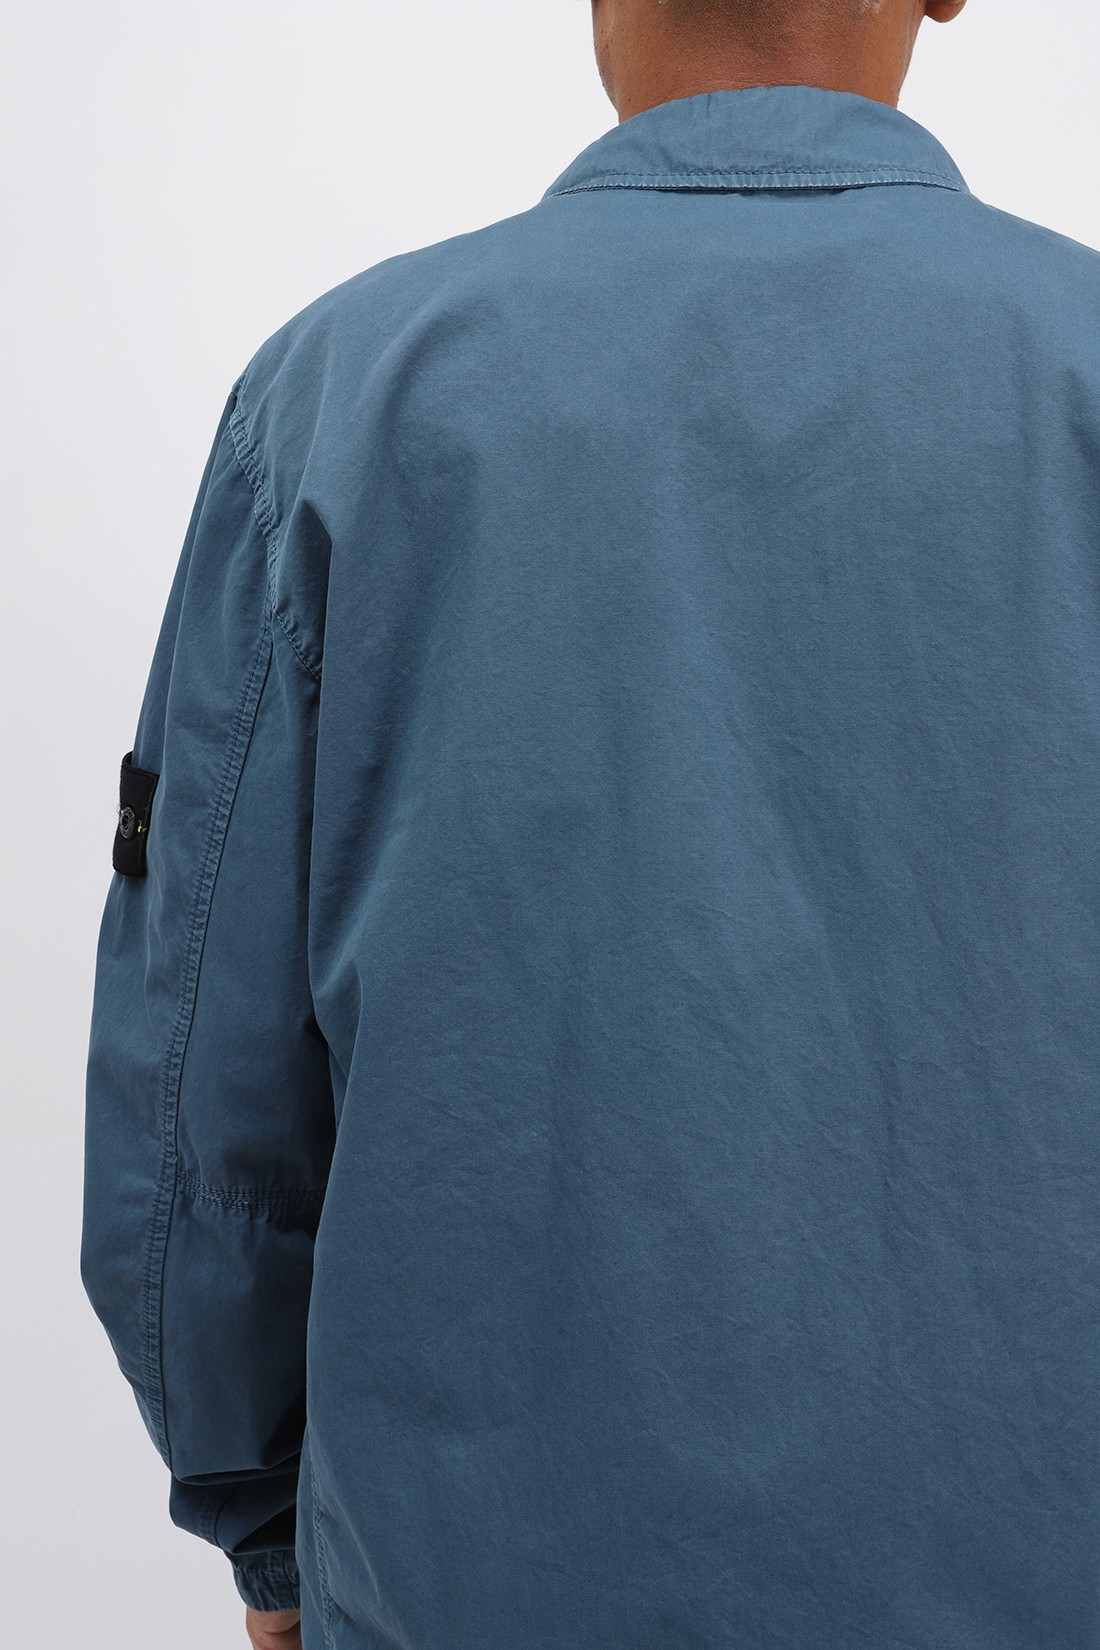 STONE ISLAND / 113wn overshirt v0123 Ottanio